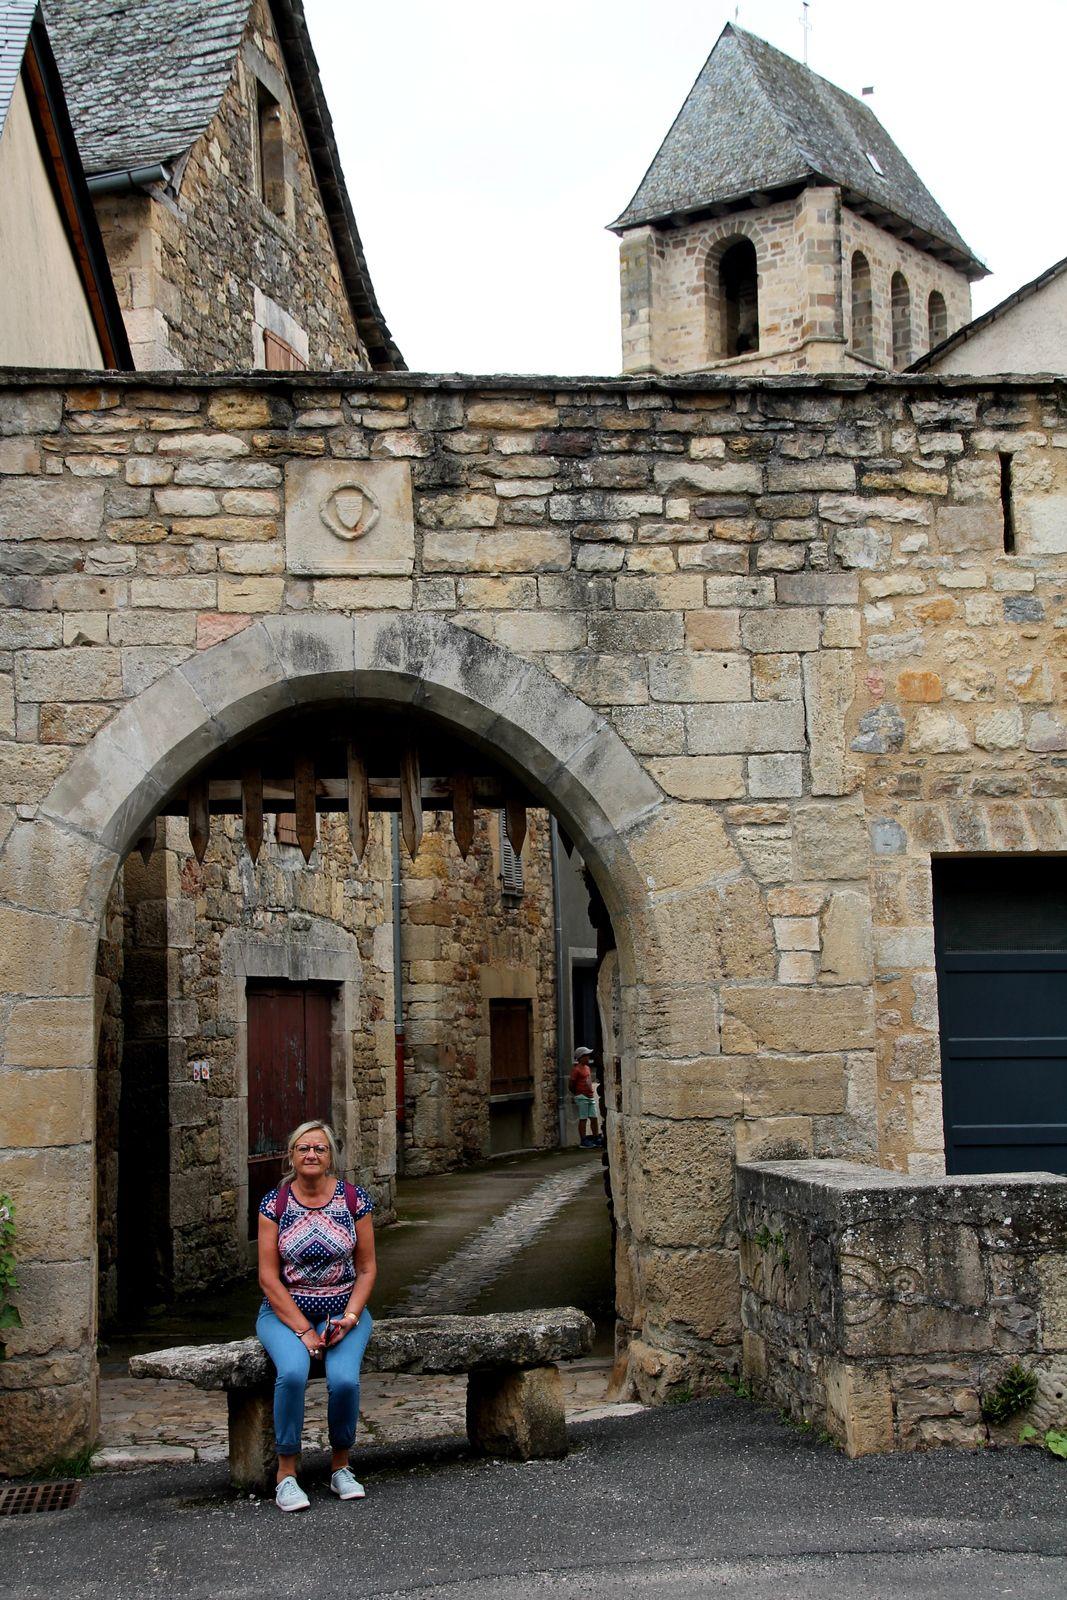 La flaune - balade aveyronnaise à Vimenet, village médiéval